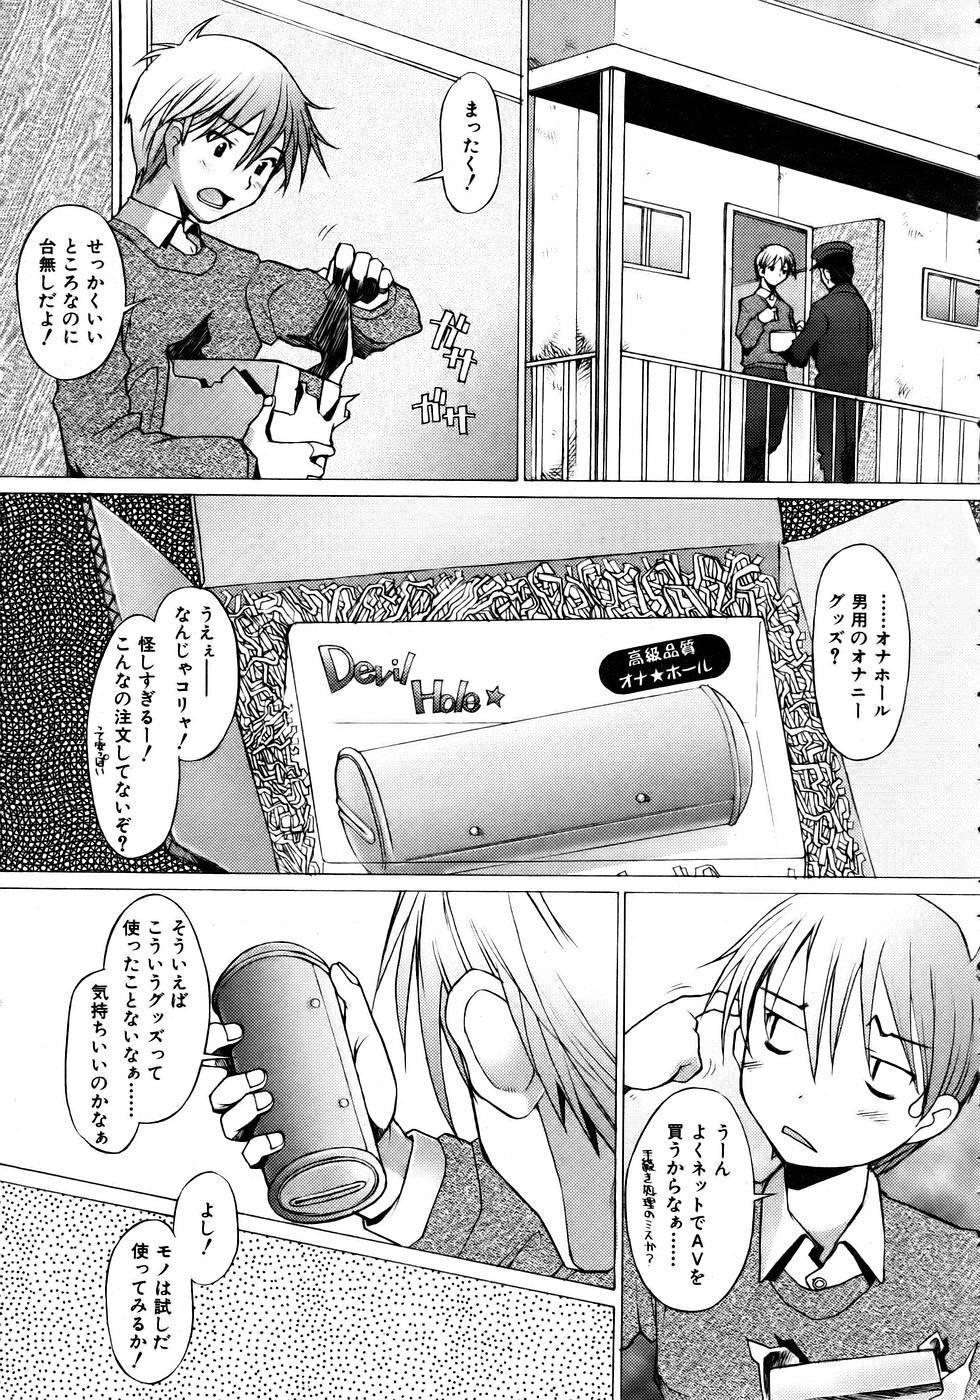 COMIC AUN 2005-12 Vol. 115 166